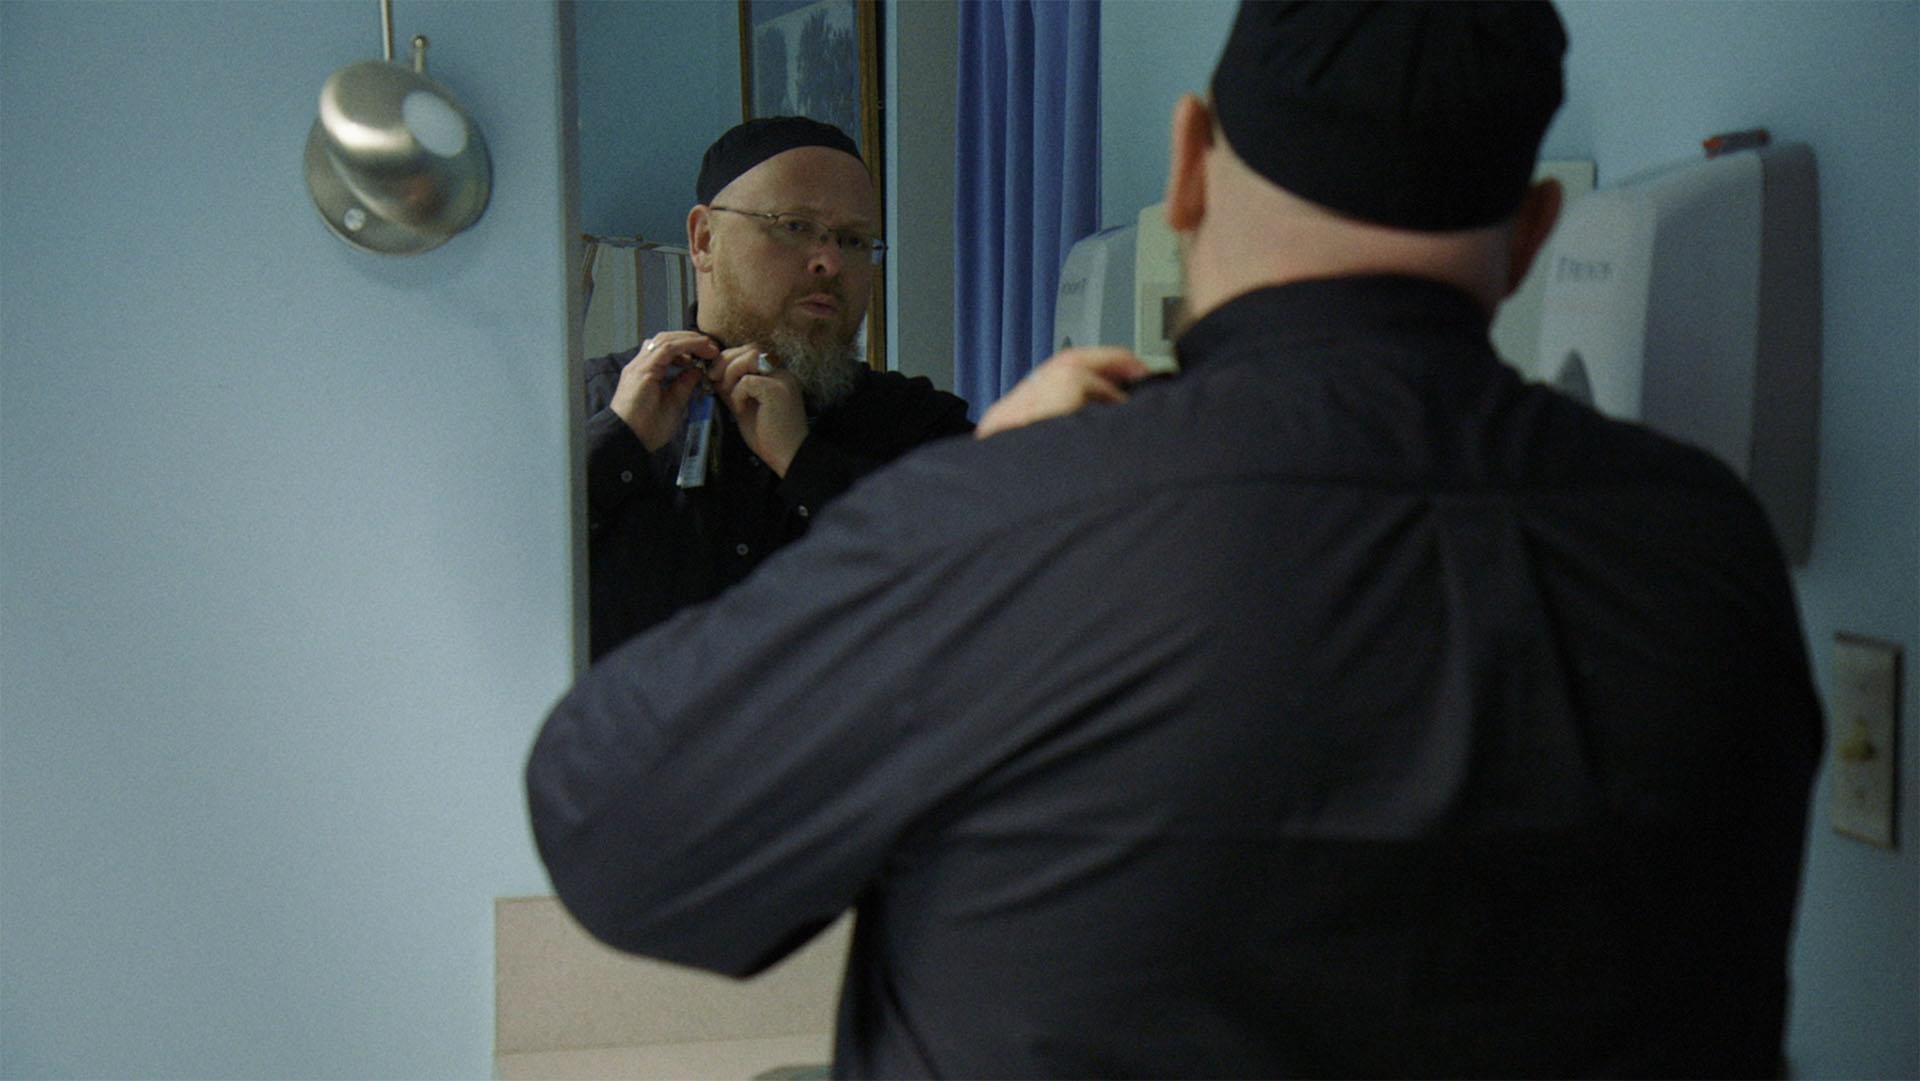 Redneck Muslim Shane at Hospital 300dpi_MASTER.jpg